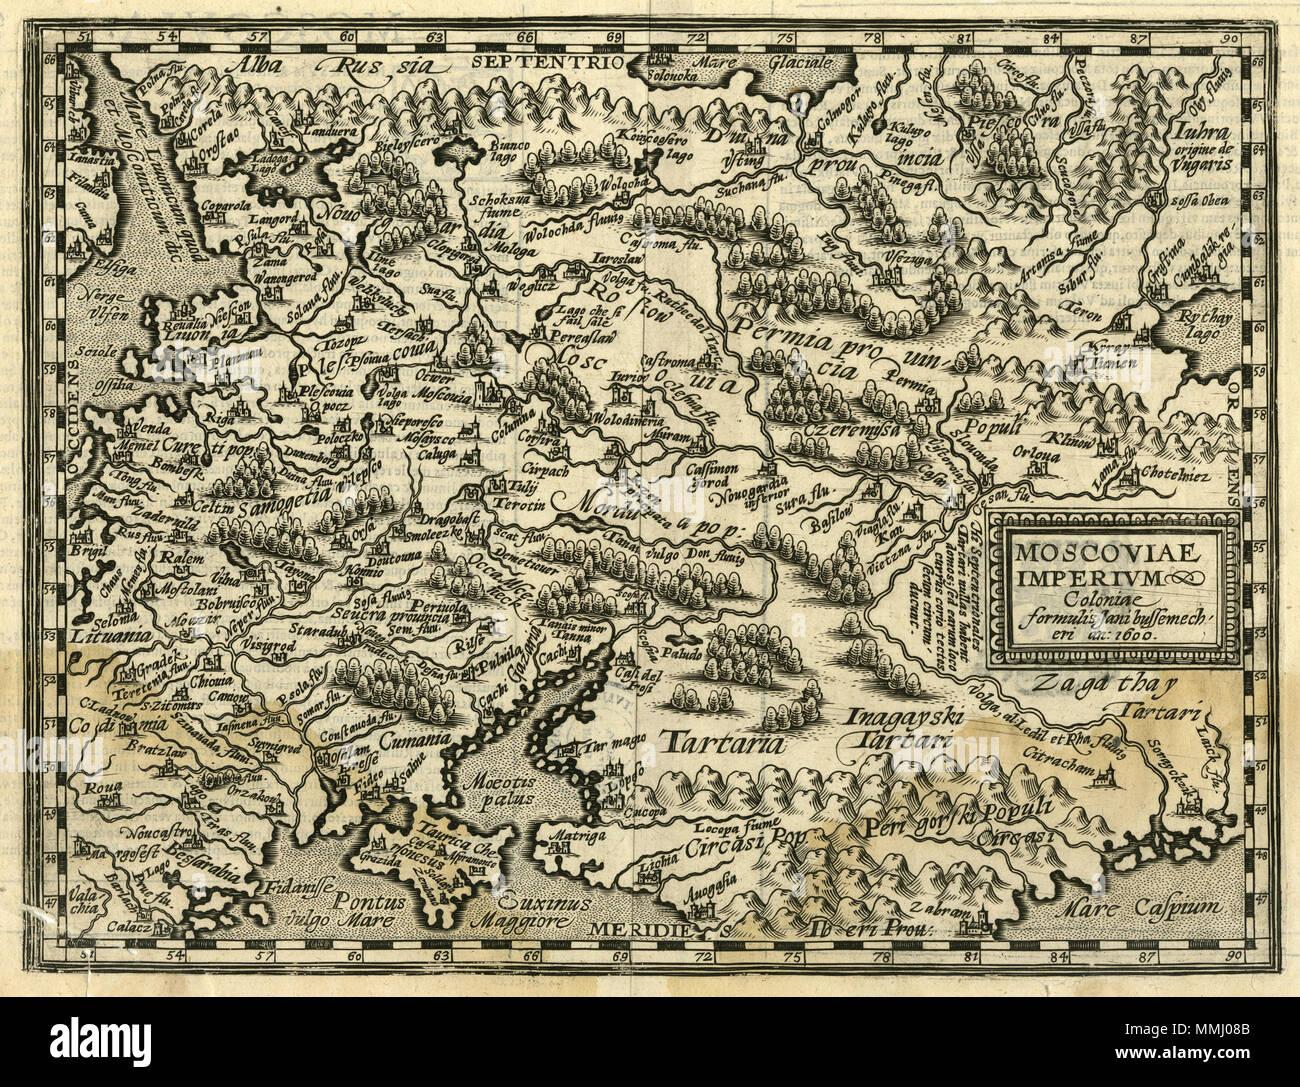 Map Europe 16th Century Stock Photos Map Europe 16th Century Stock